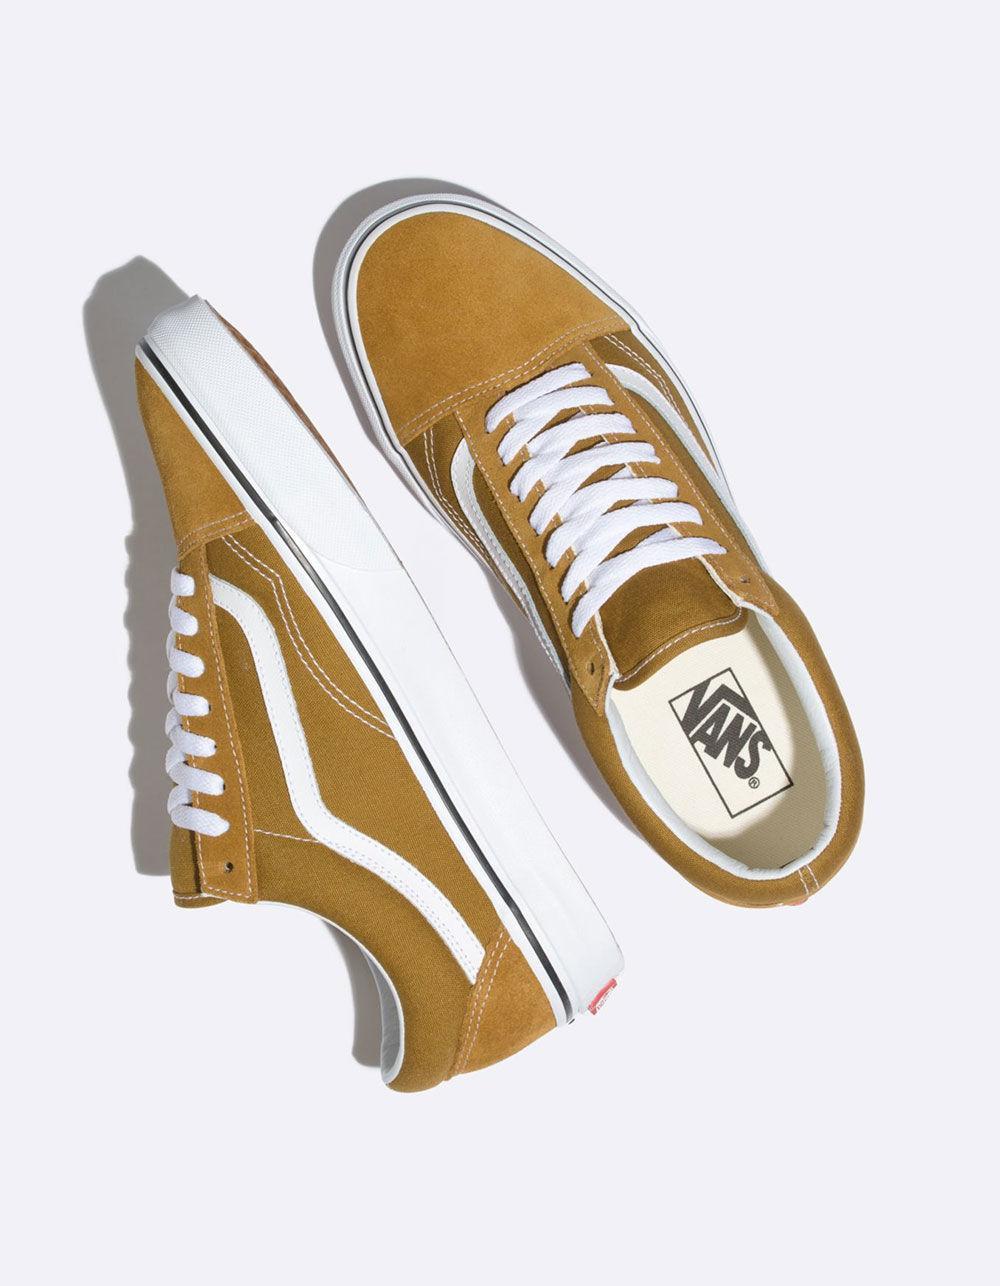 14dd0ef091d0e6 Vans - Old Skool Cumin   True White Shoes - Lyst. View fullscreen